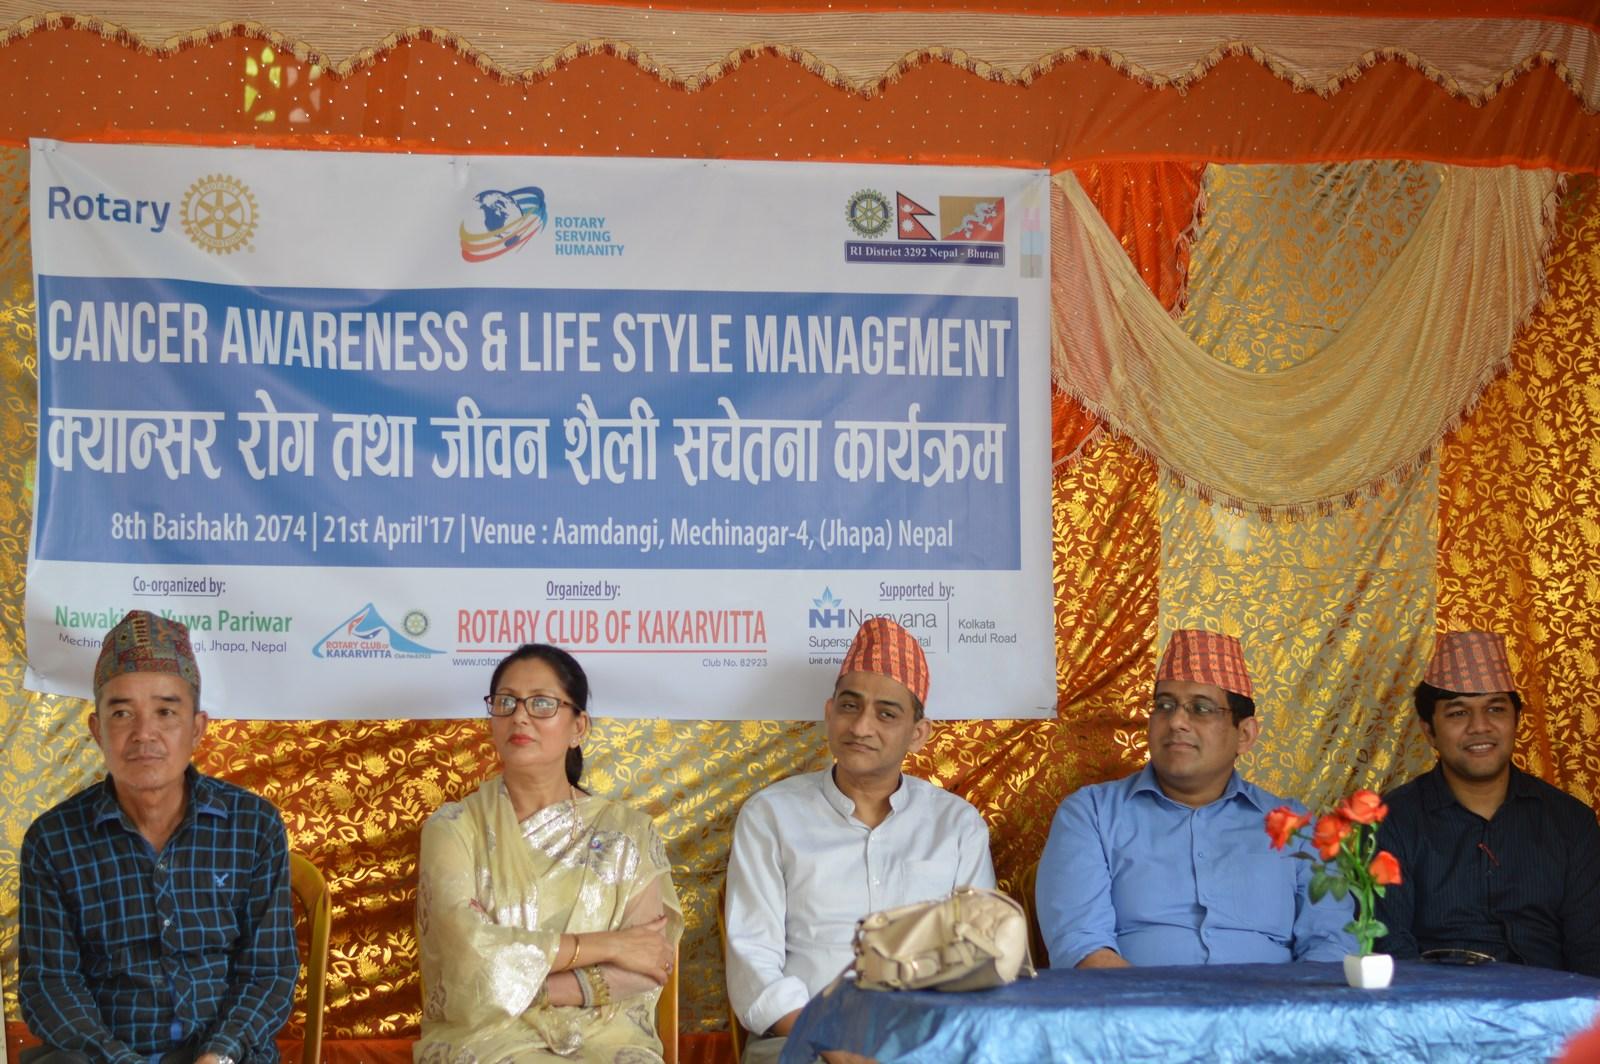 Cancer-Awareness-Life-Style-Management-Interaction-Program-2016-17-Rotary-Club-of-Kakarvitta-9